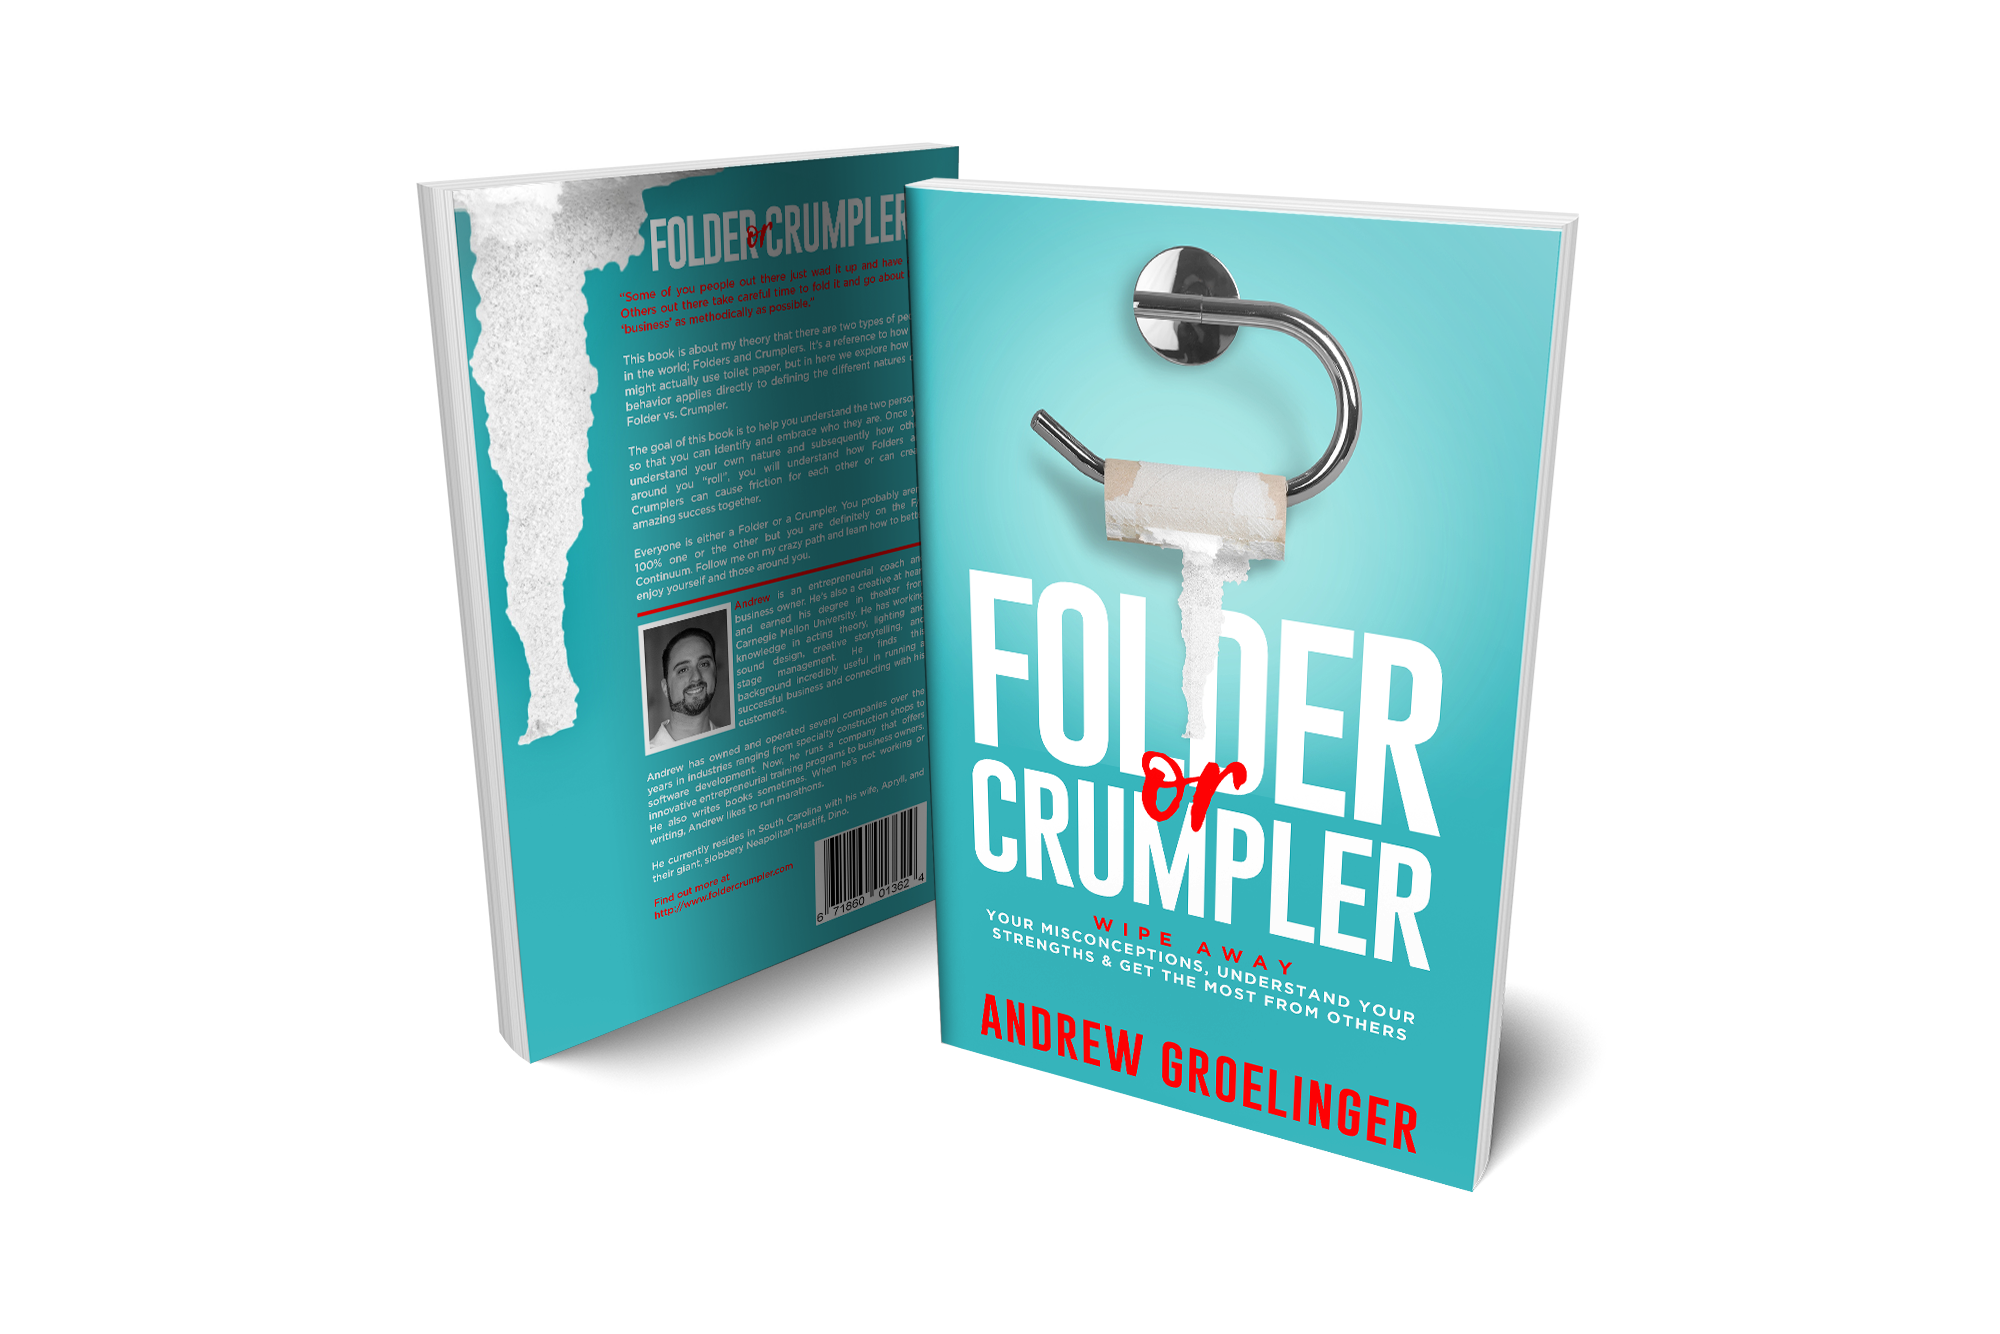 Folder or Crumpler Book